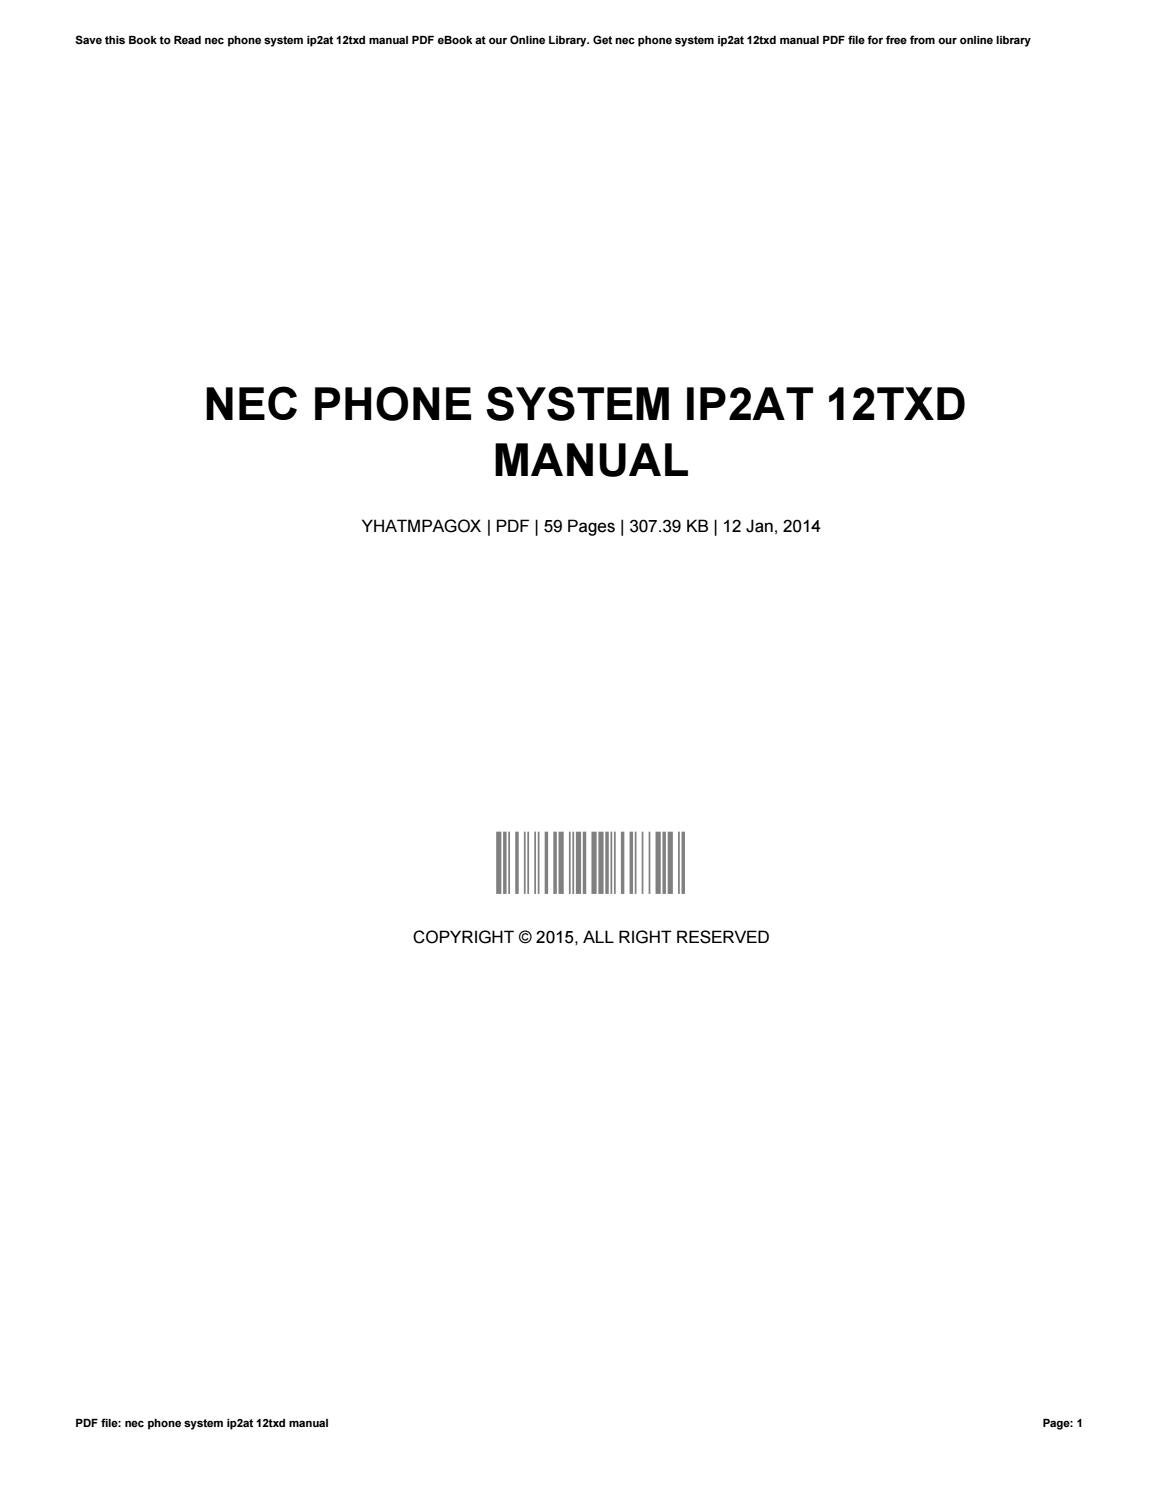 nec phone system ip2at 12txd manual by mathewcockrell1952 issuu rh issuu com Westinghouse TV Manual Westinghouse TV Manual